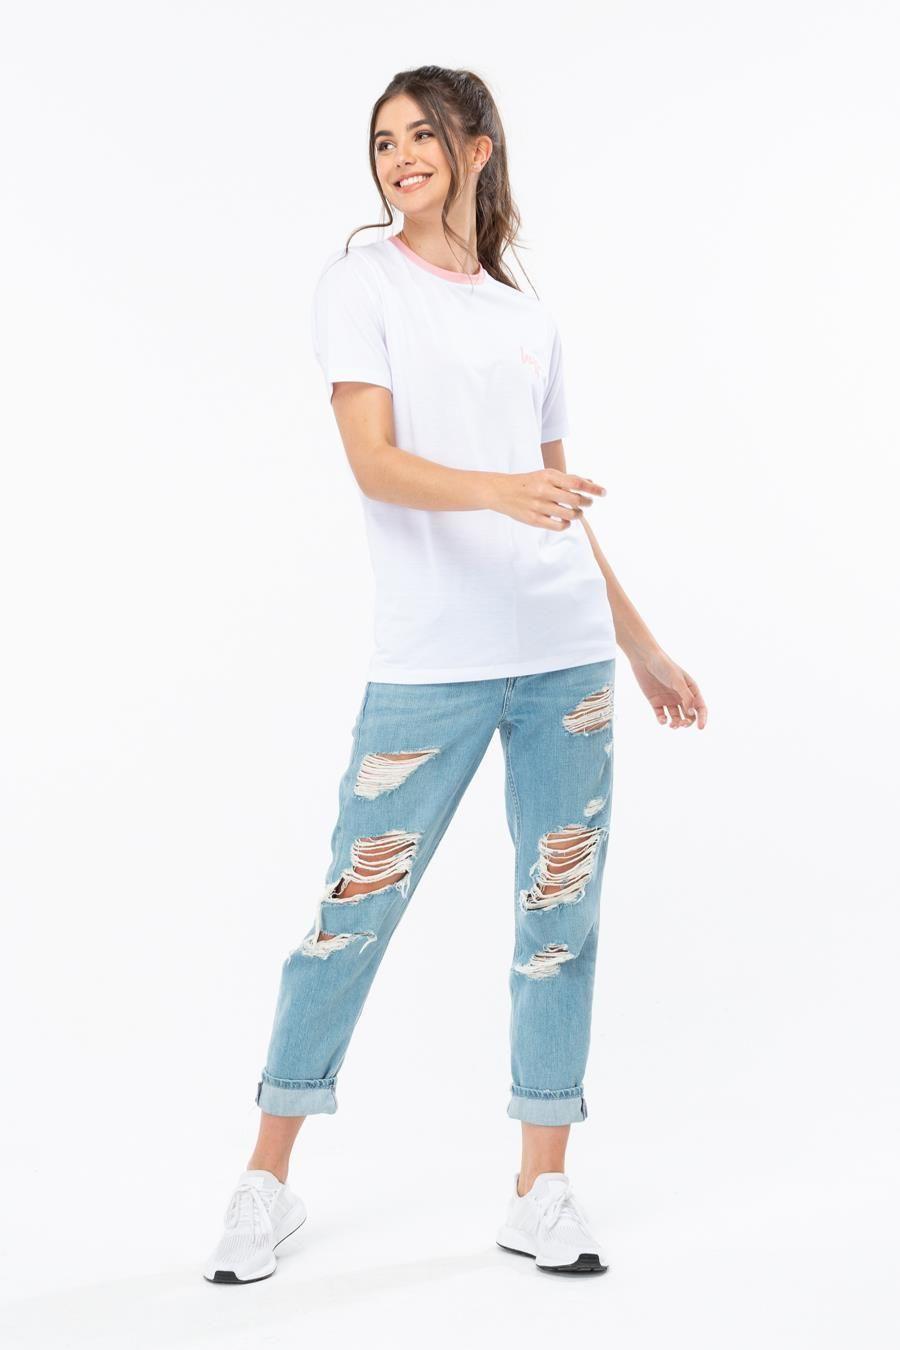 Hype Toy Story White Lotso Ringer Womens T-Shirt